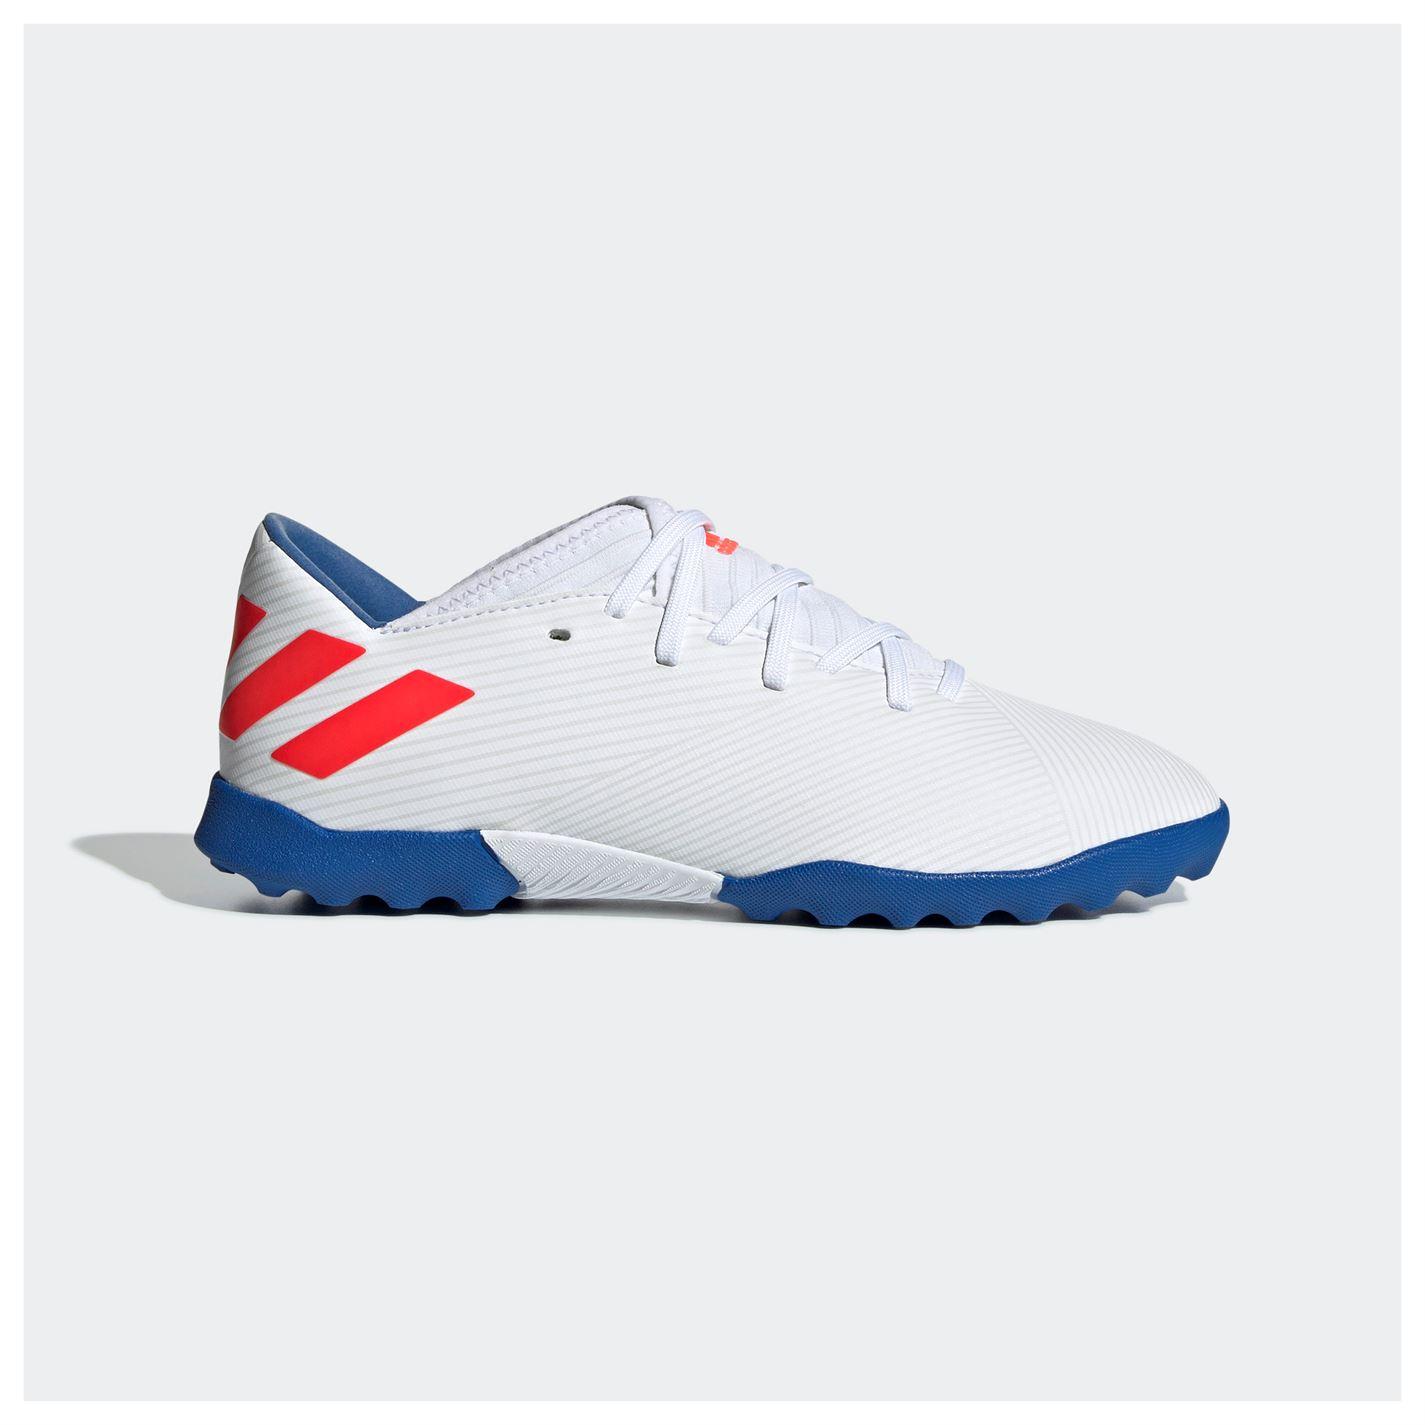 boty adidas Nemeziz Messi 19.3 dětské Astro Turf